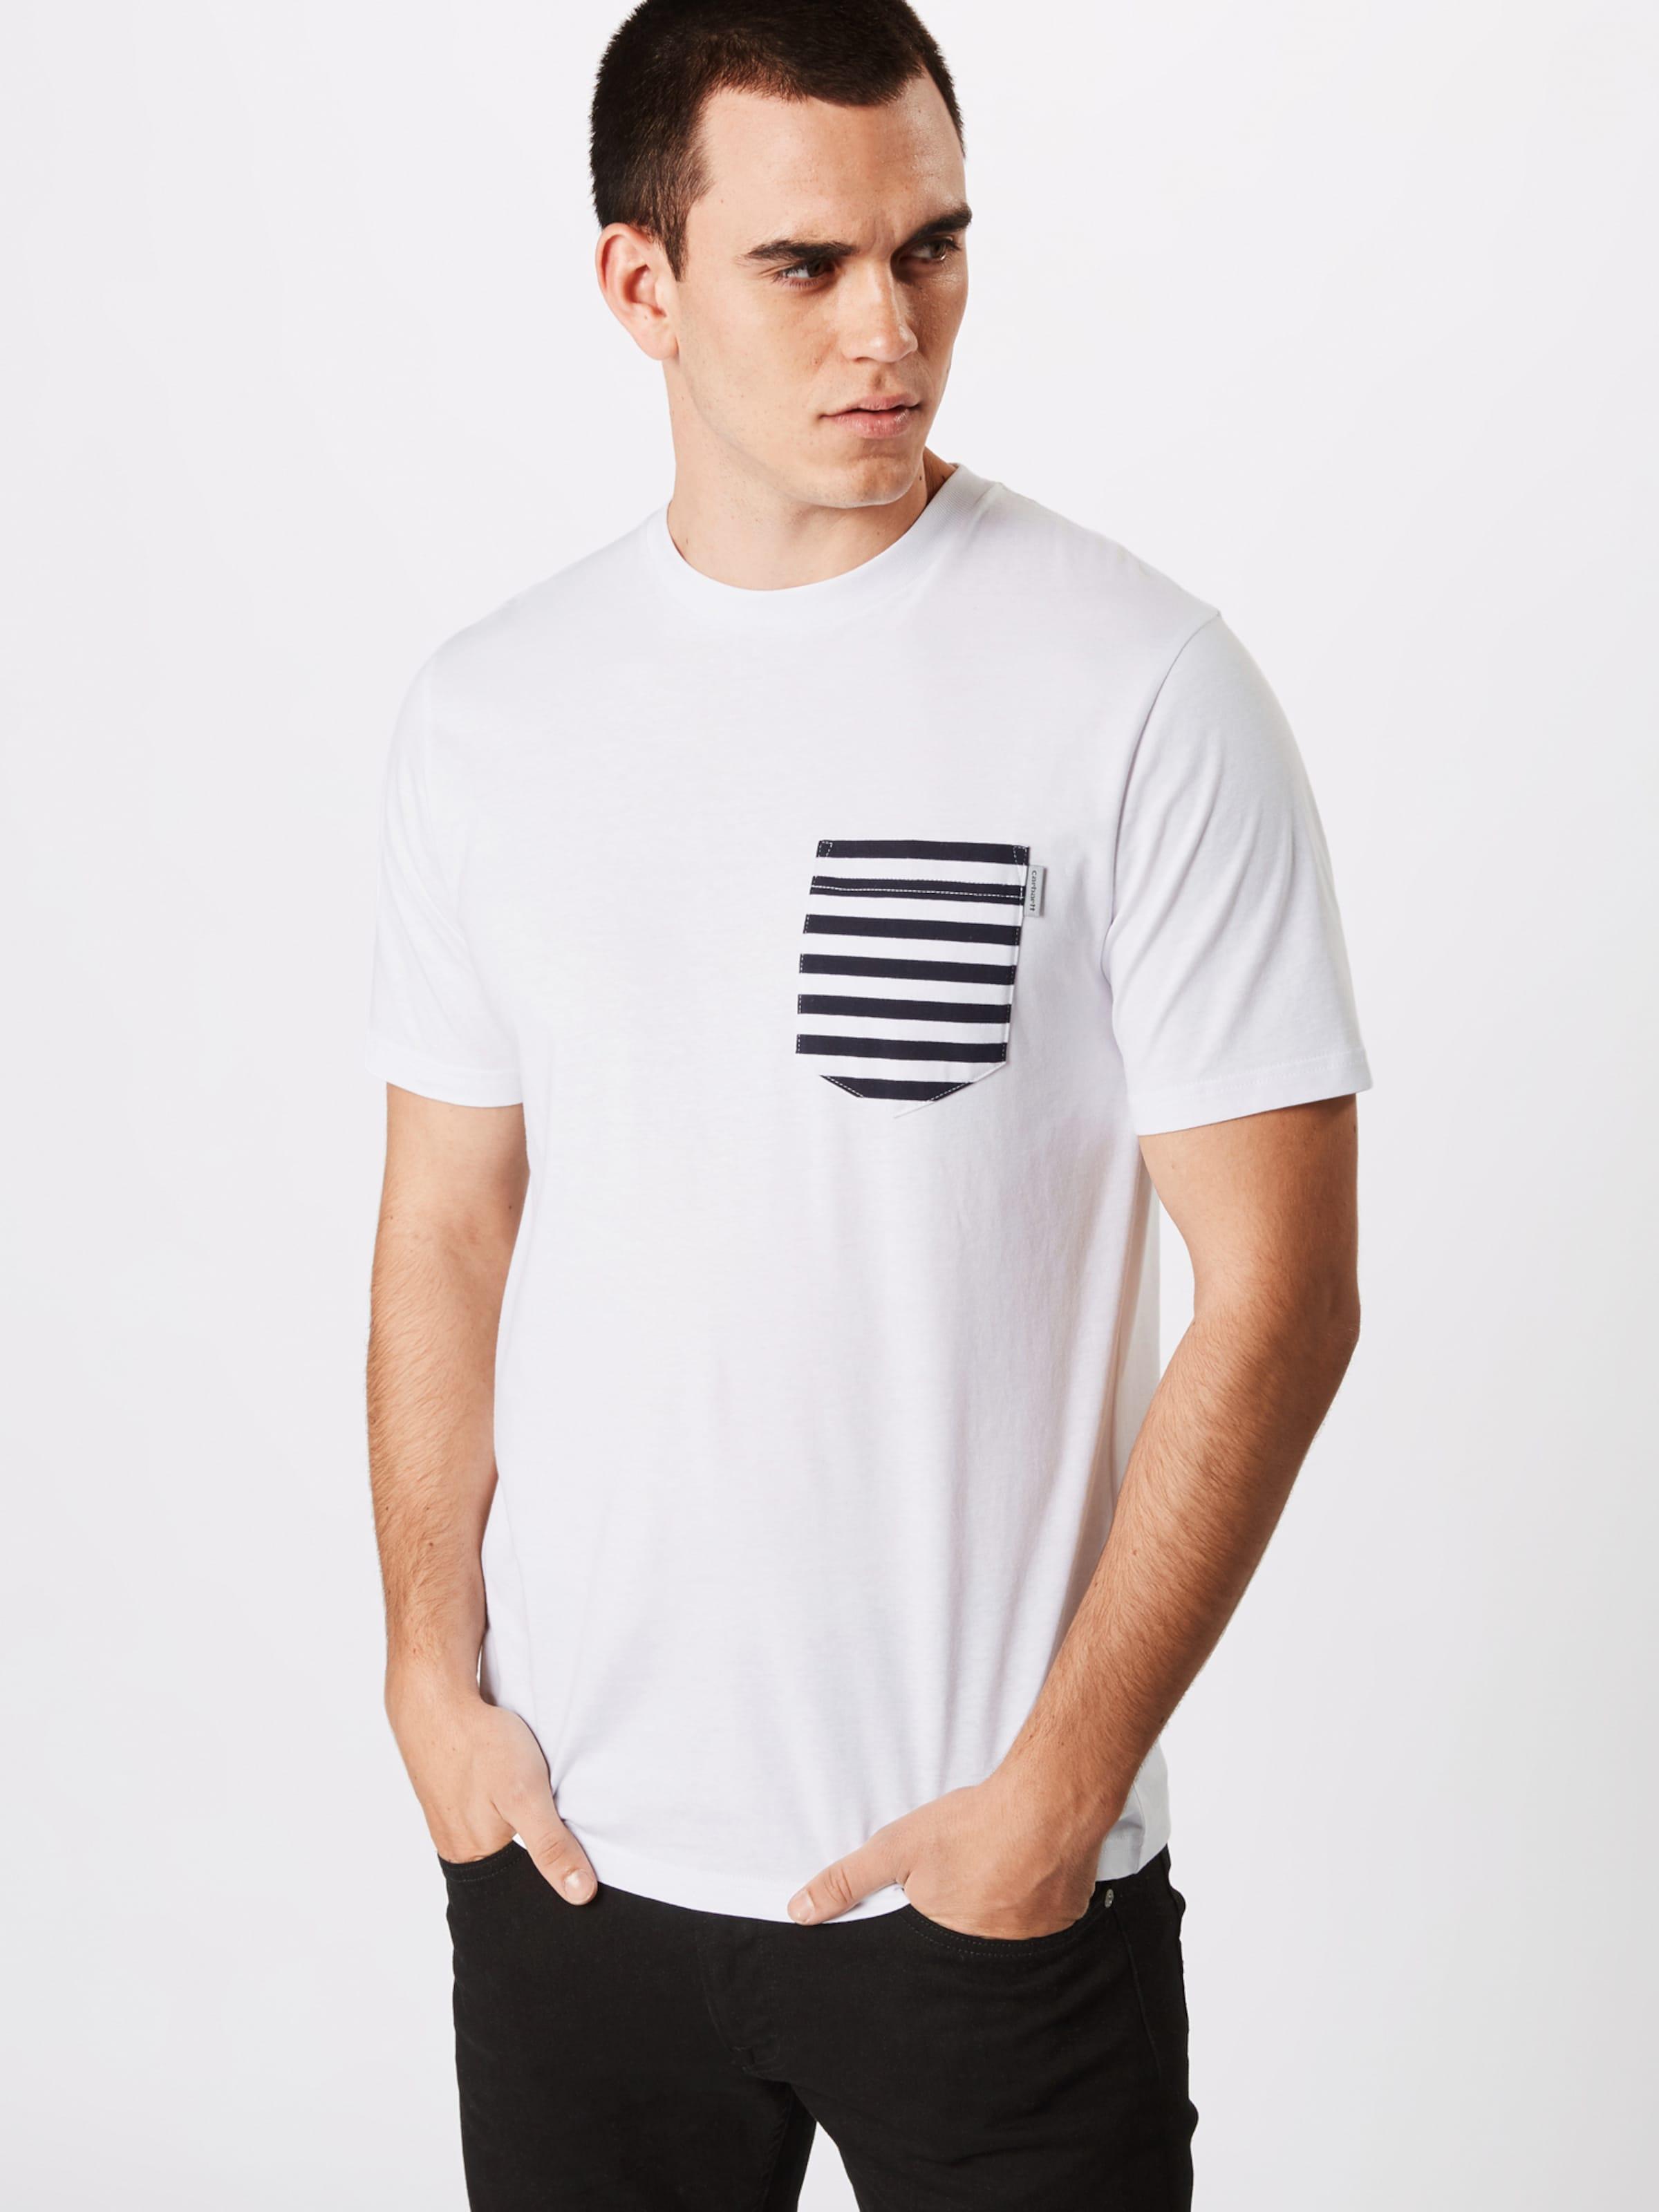 T Carhartt Bleu MarineBlanc 'contrast Wip Pocket' shirt En PZuiTkOX